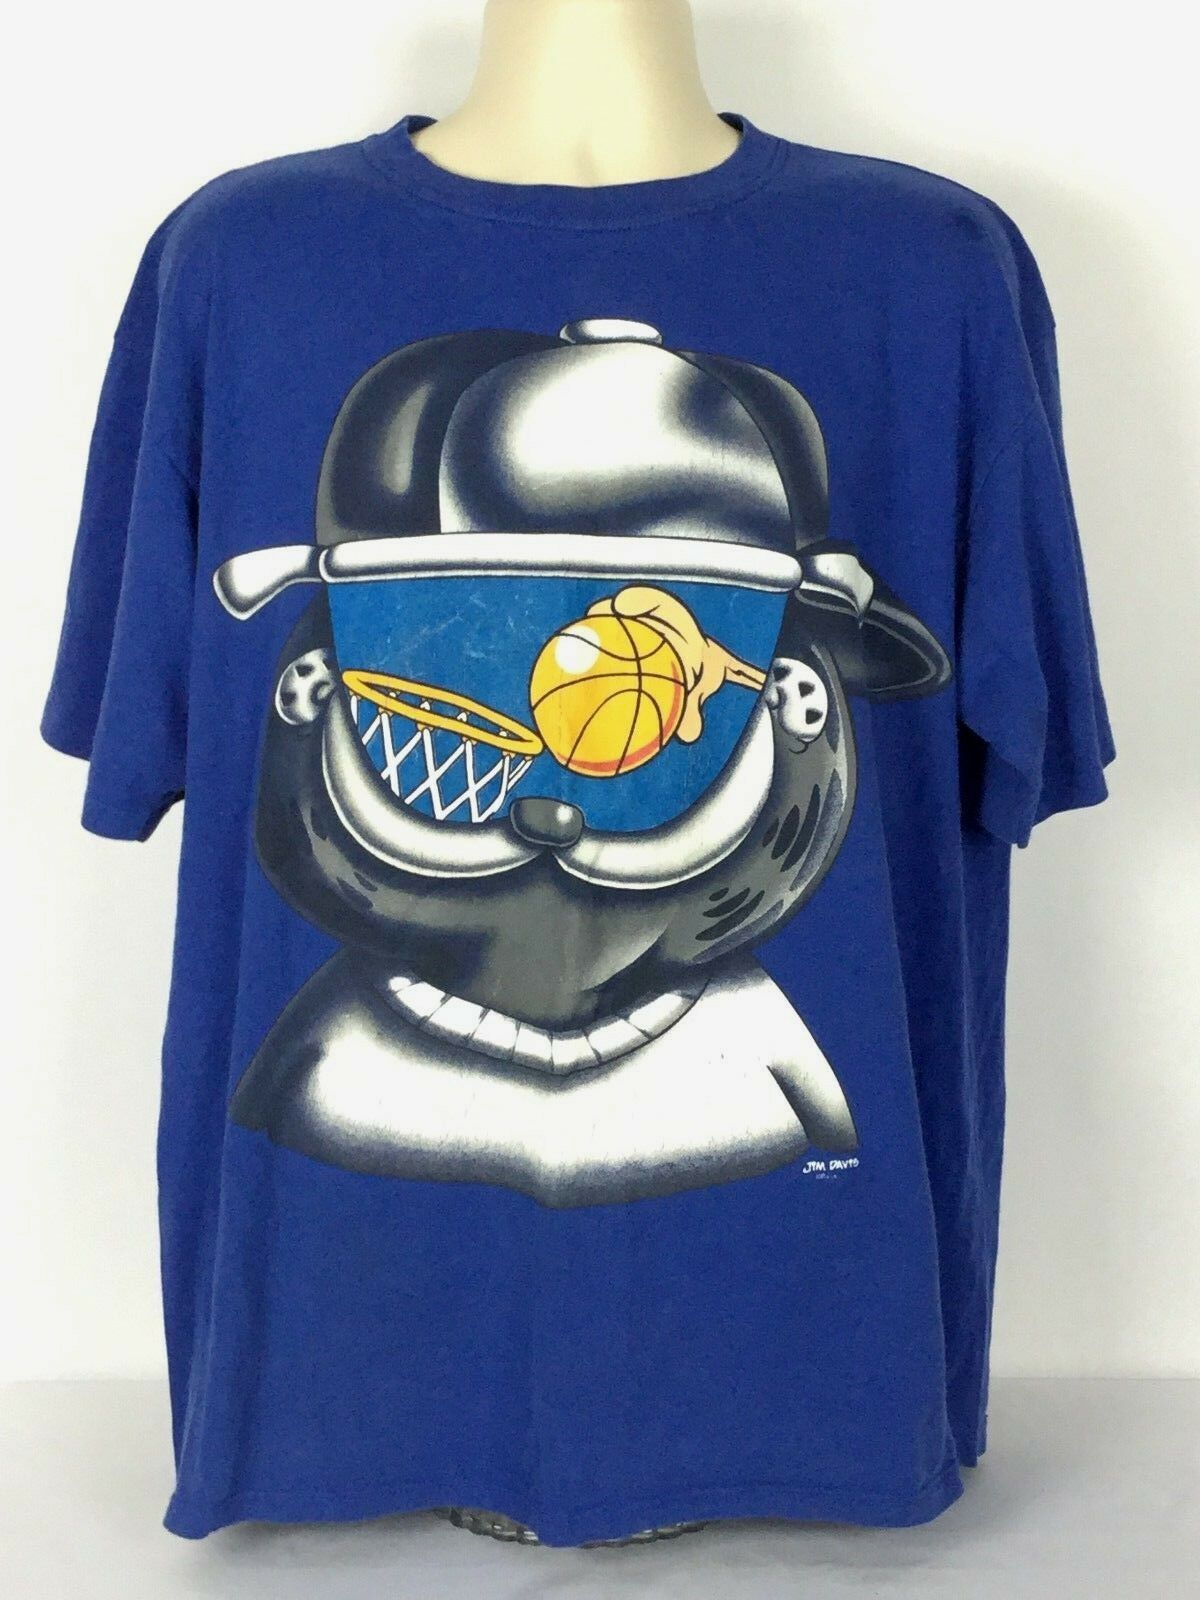 Sun Garfield Vintage XL Basketball Game TV Graphic Tee T-Shirt Jim Davis